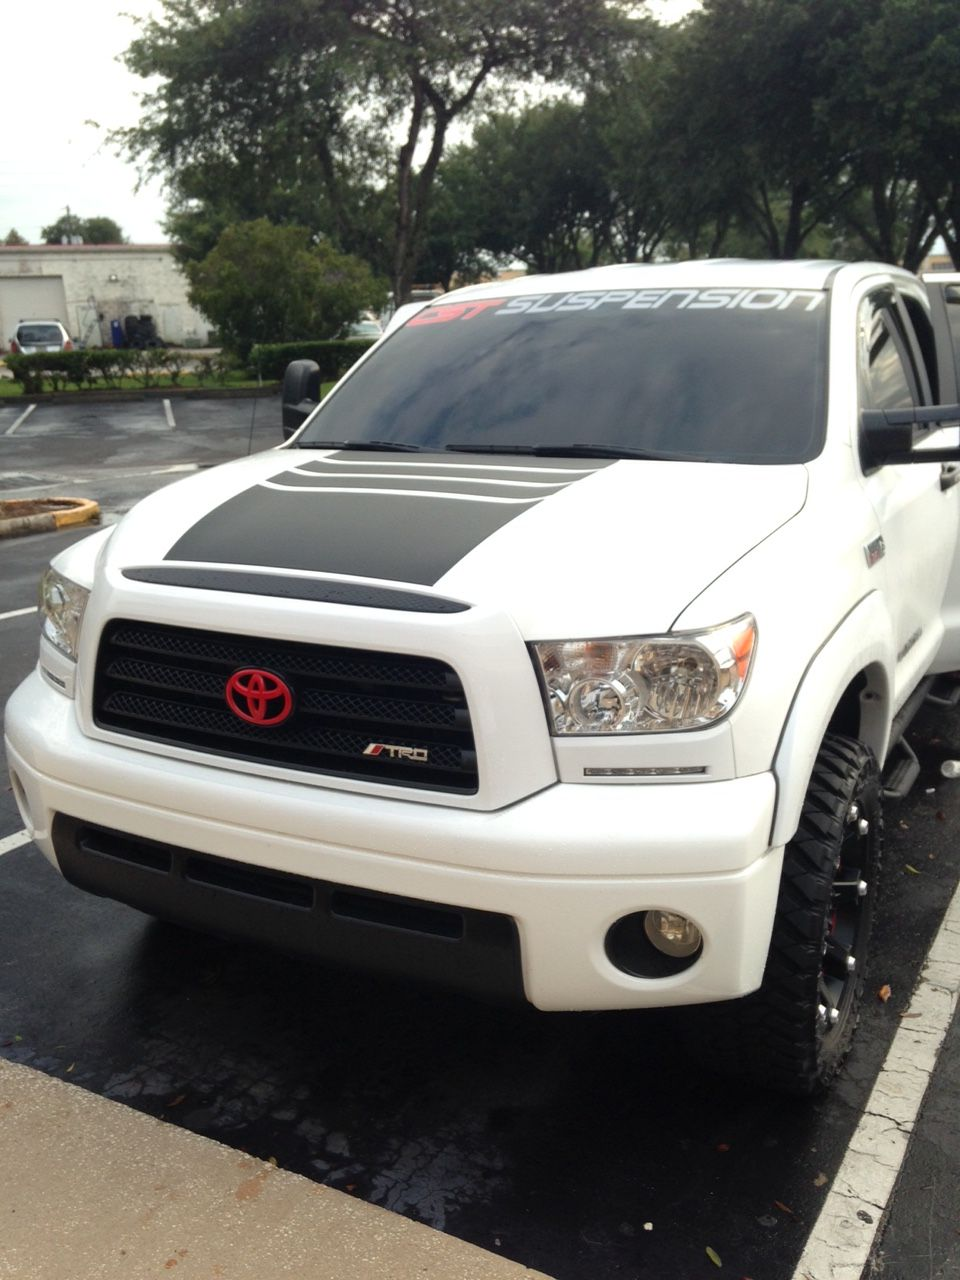 Custom Hood Decal Toyota Tundra Pinterest Toyota Tundra And - Custom tundra truck decals